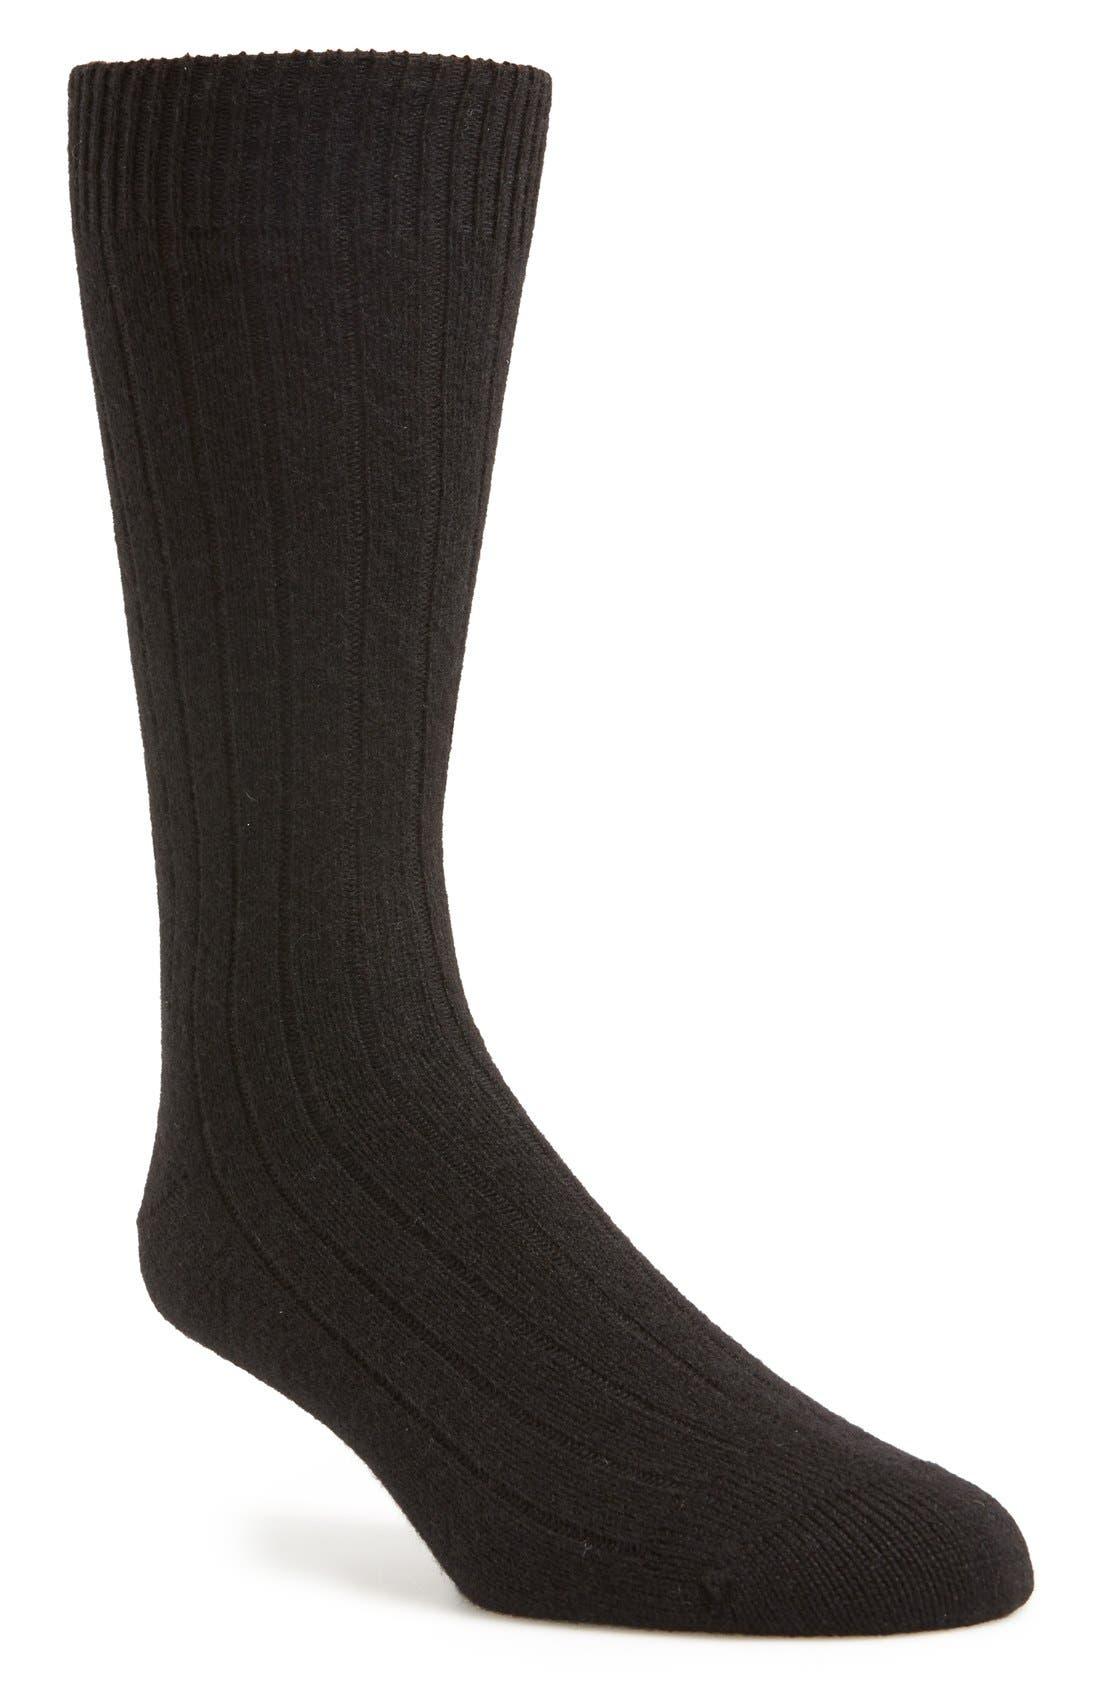 'Waddington' Cashmere Blend Mid Calf Socks,                             Main thumbnail 3, color,